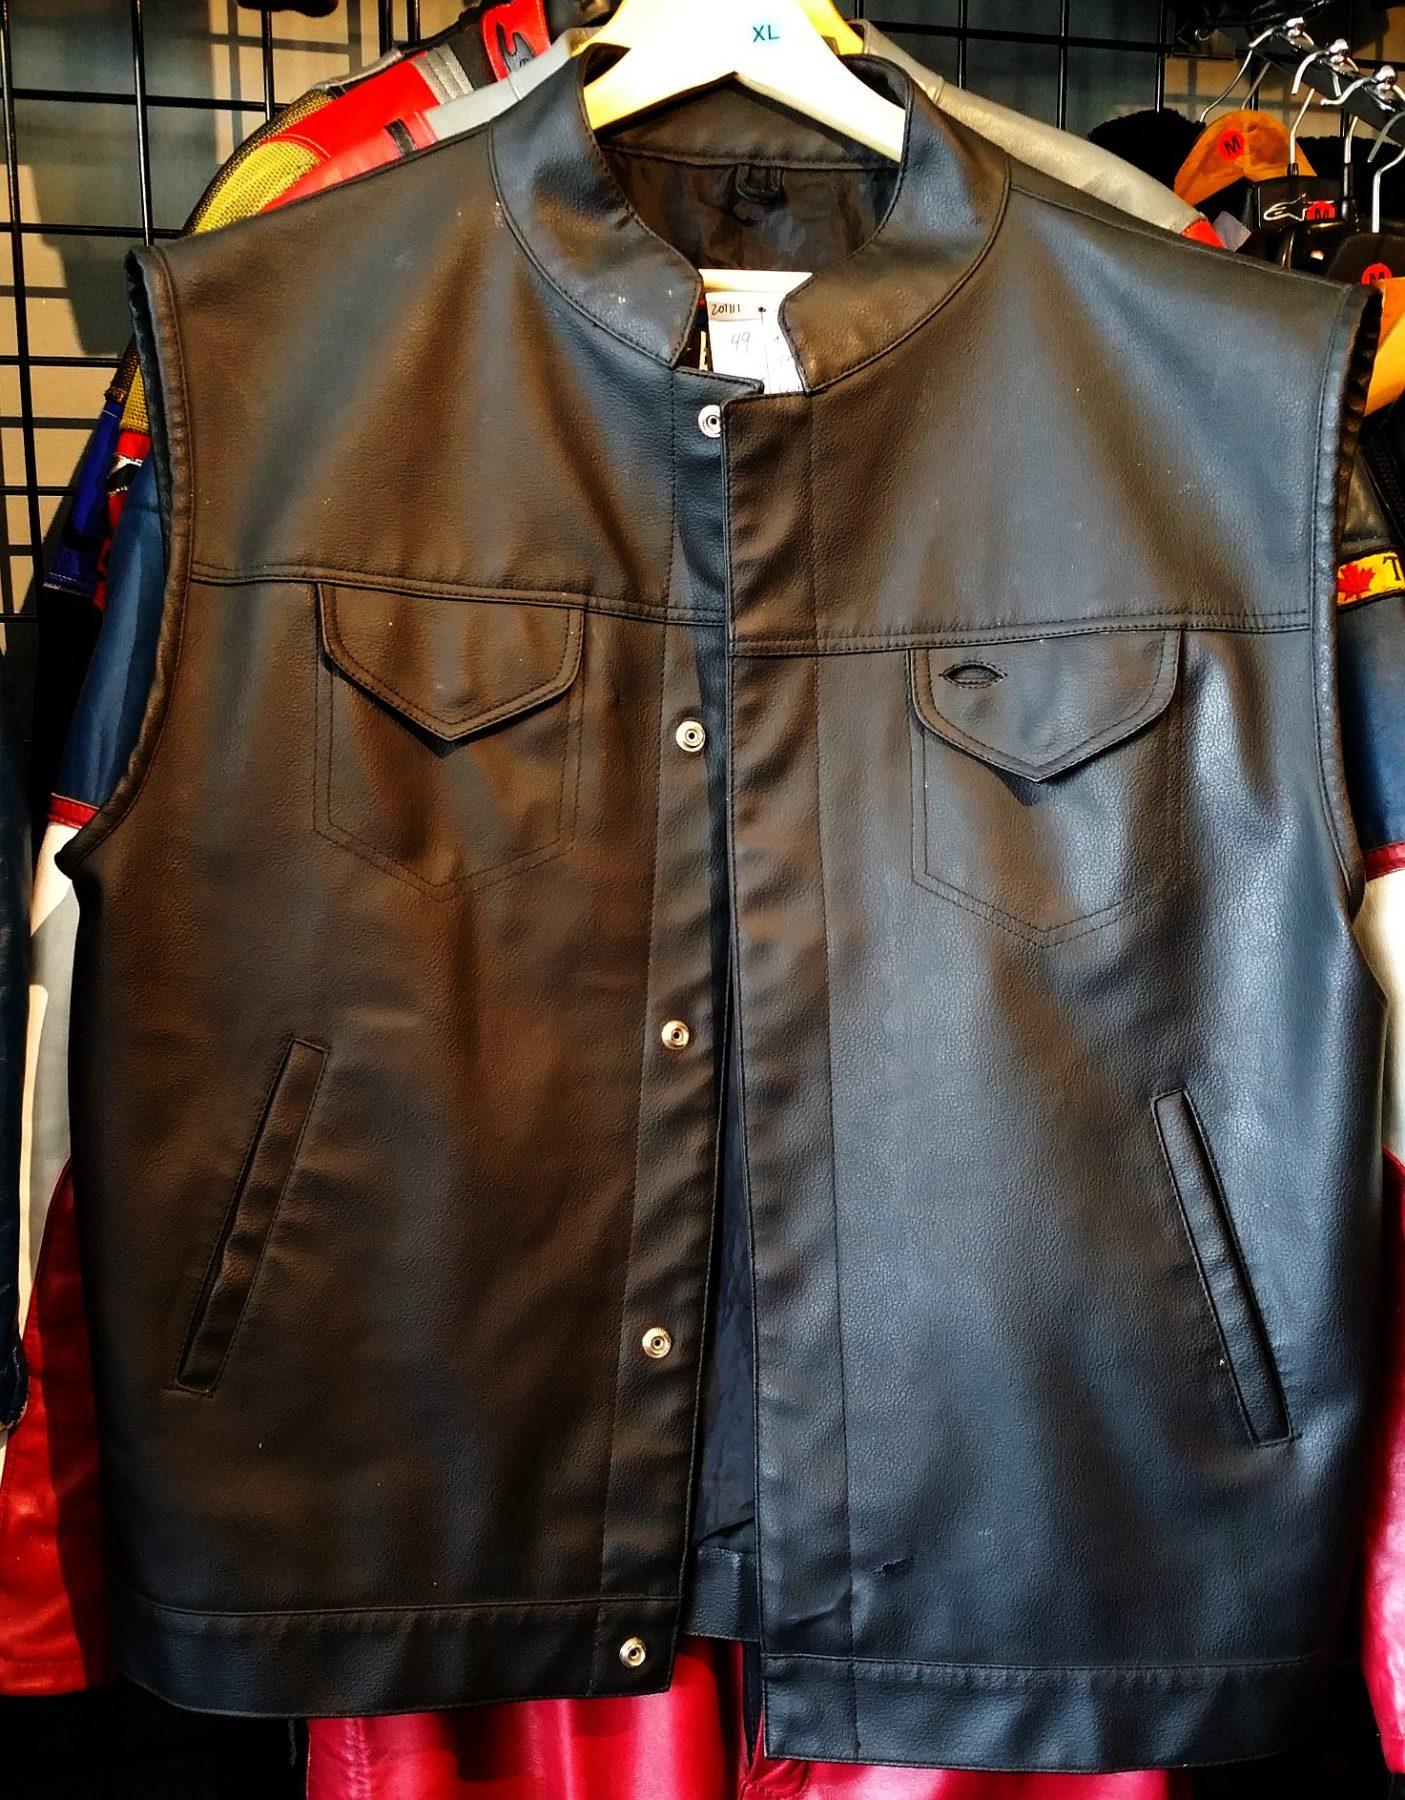 Sons of Anarchy-style club vest; cheap like borscht. Halloween!